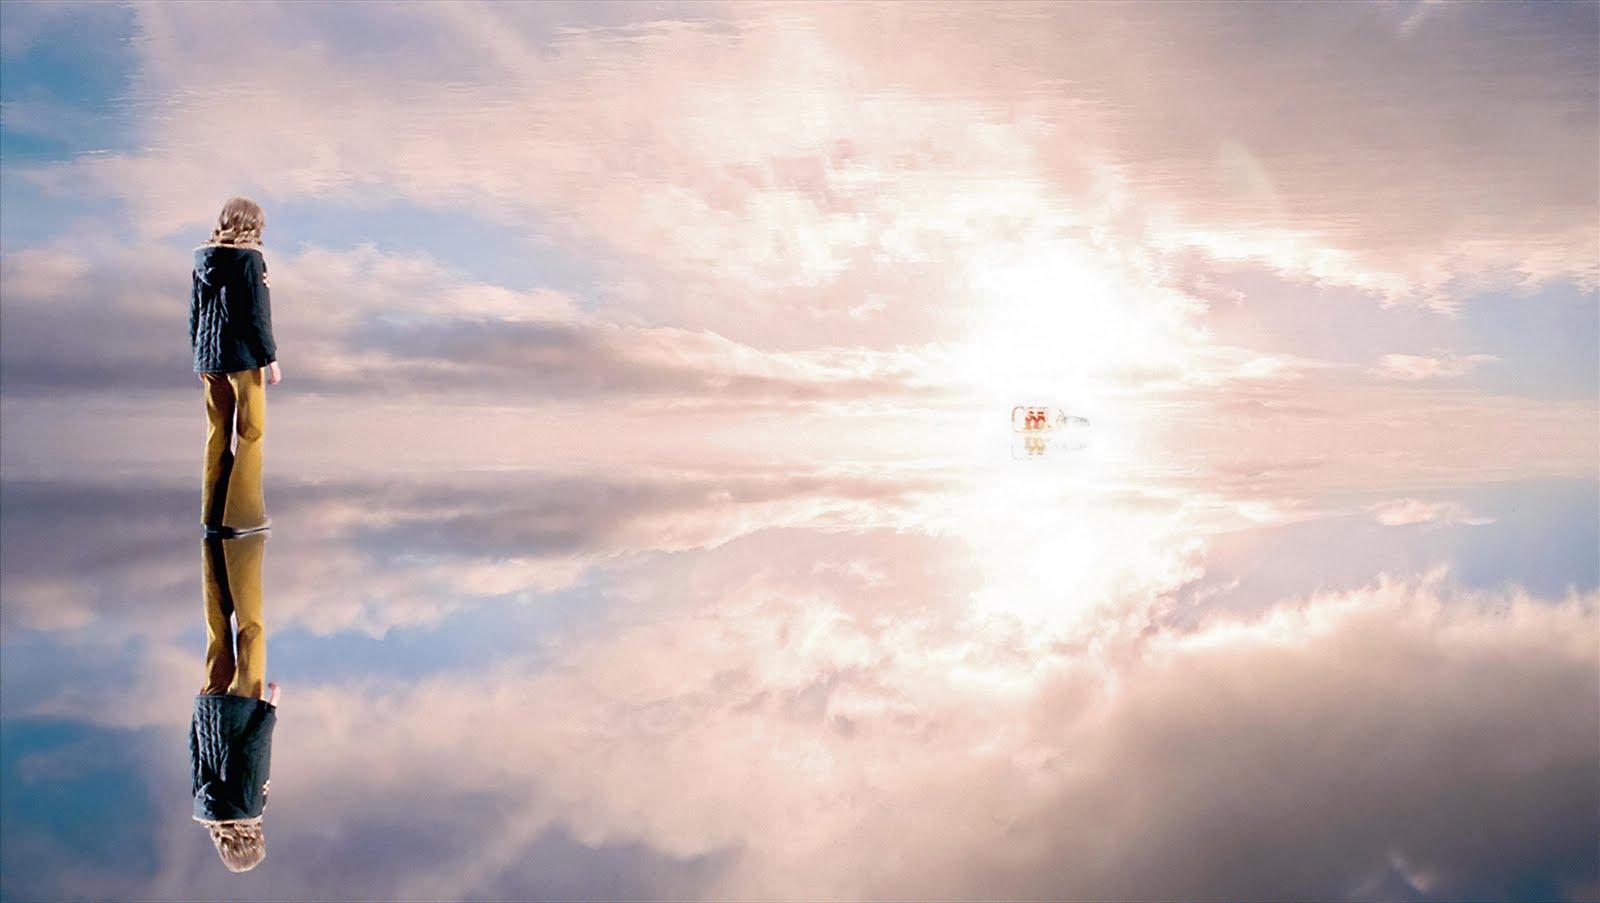 https://1.bp.blogspot.com/_pwEgF3IKxf0/S_n-mfOseyI/AAAAAAAAACY/5muLBYeDcpg/s1600/amabili-resti-immagine-film-1-cielo.jpg